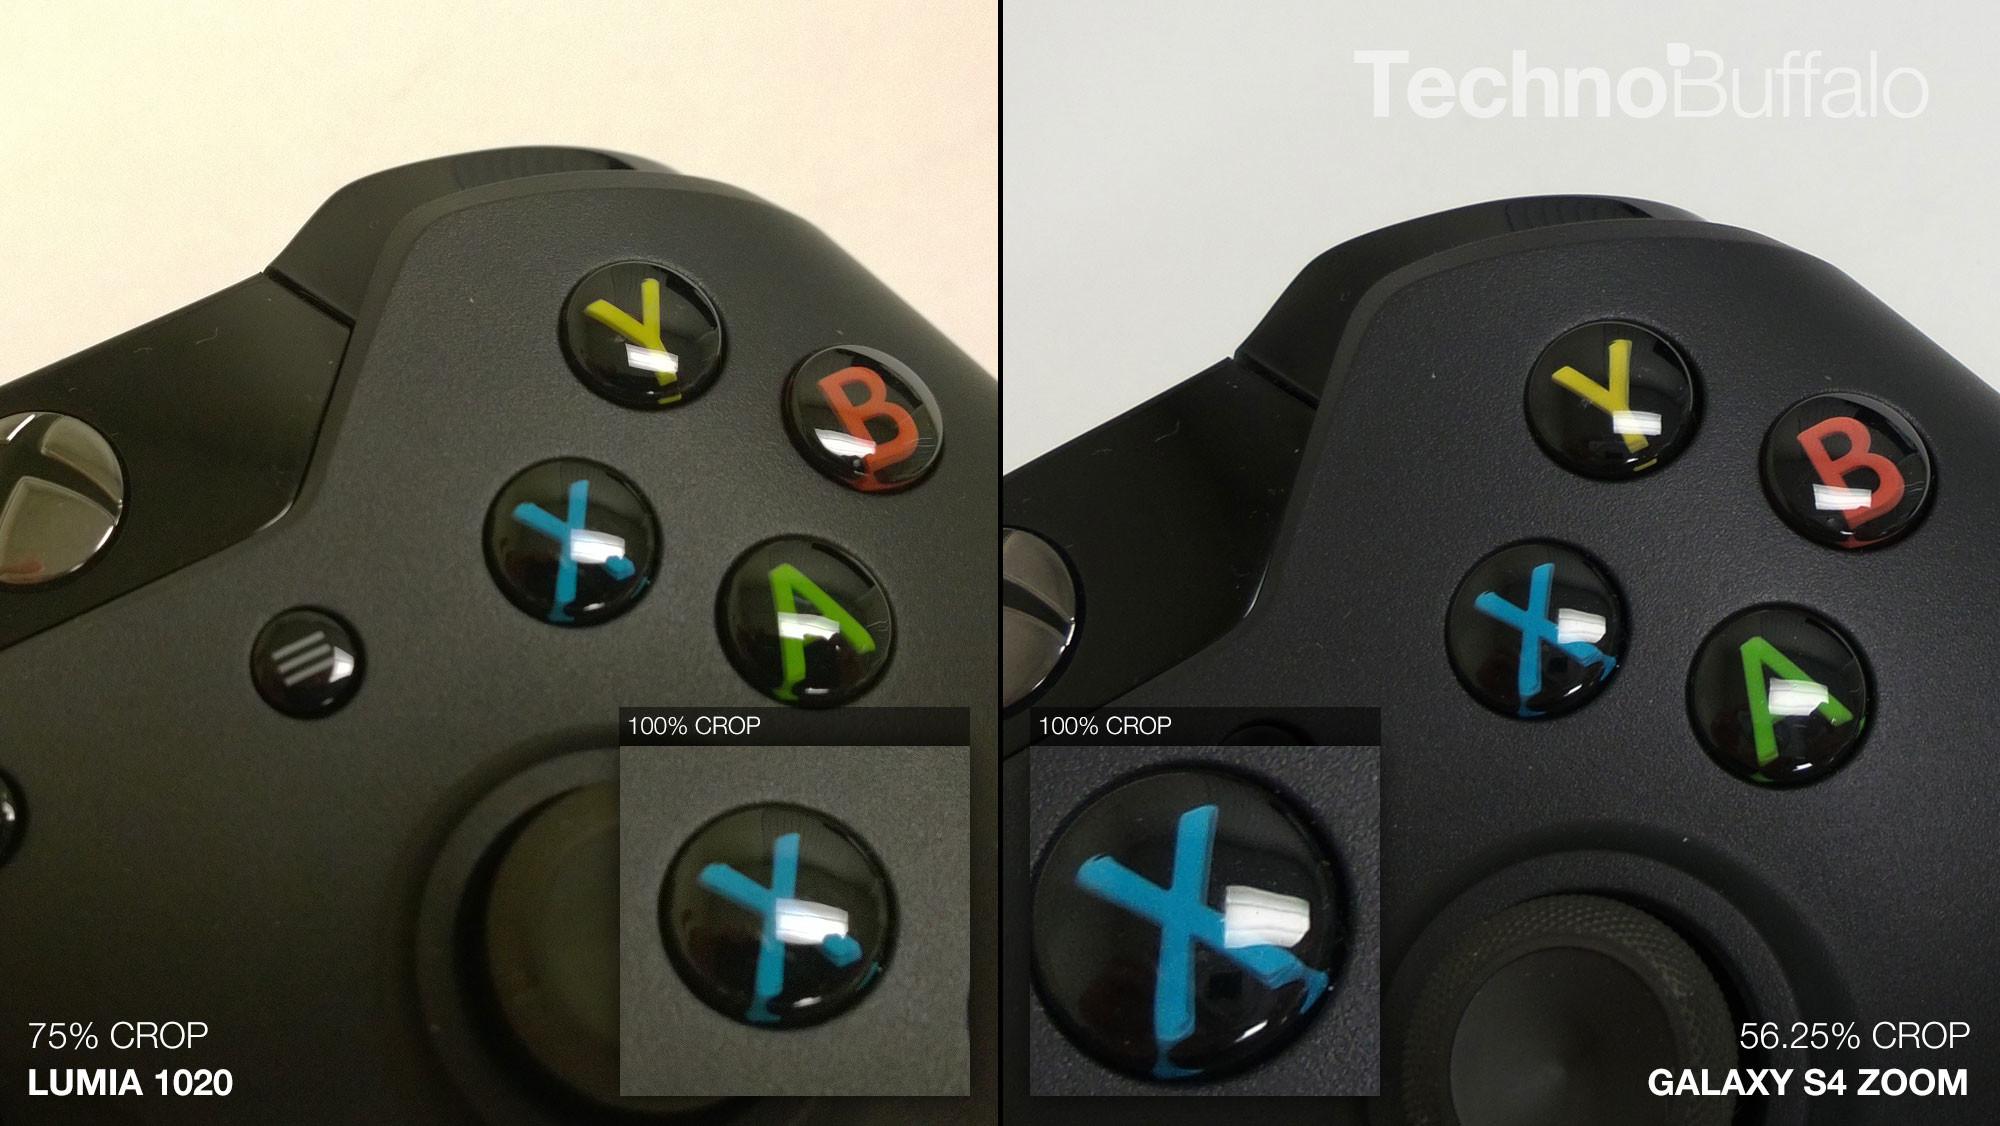 Fonds d'écran Xbox One : tous les wallpapers Xbox One HTML code